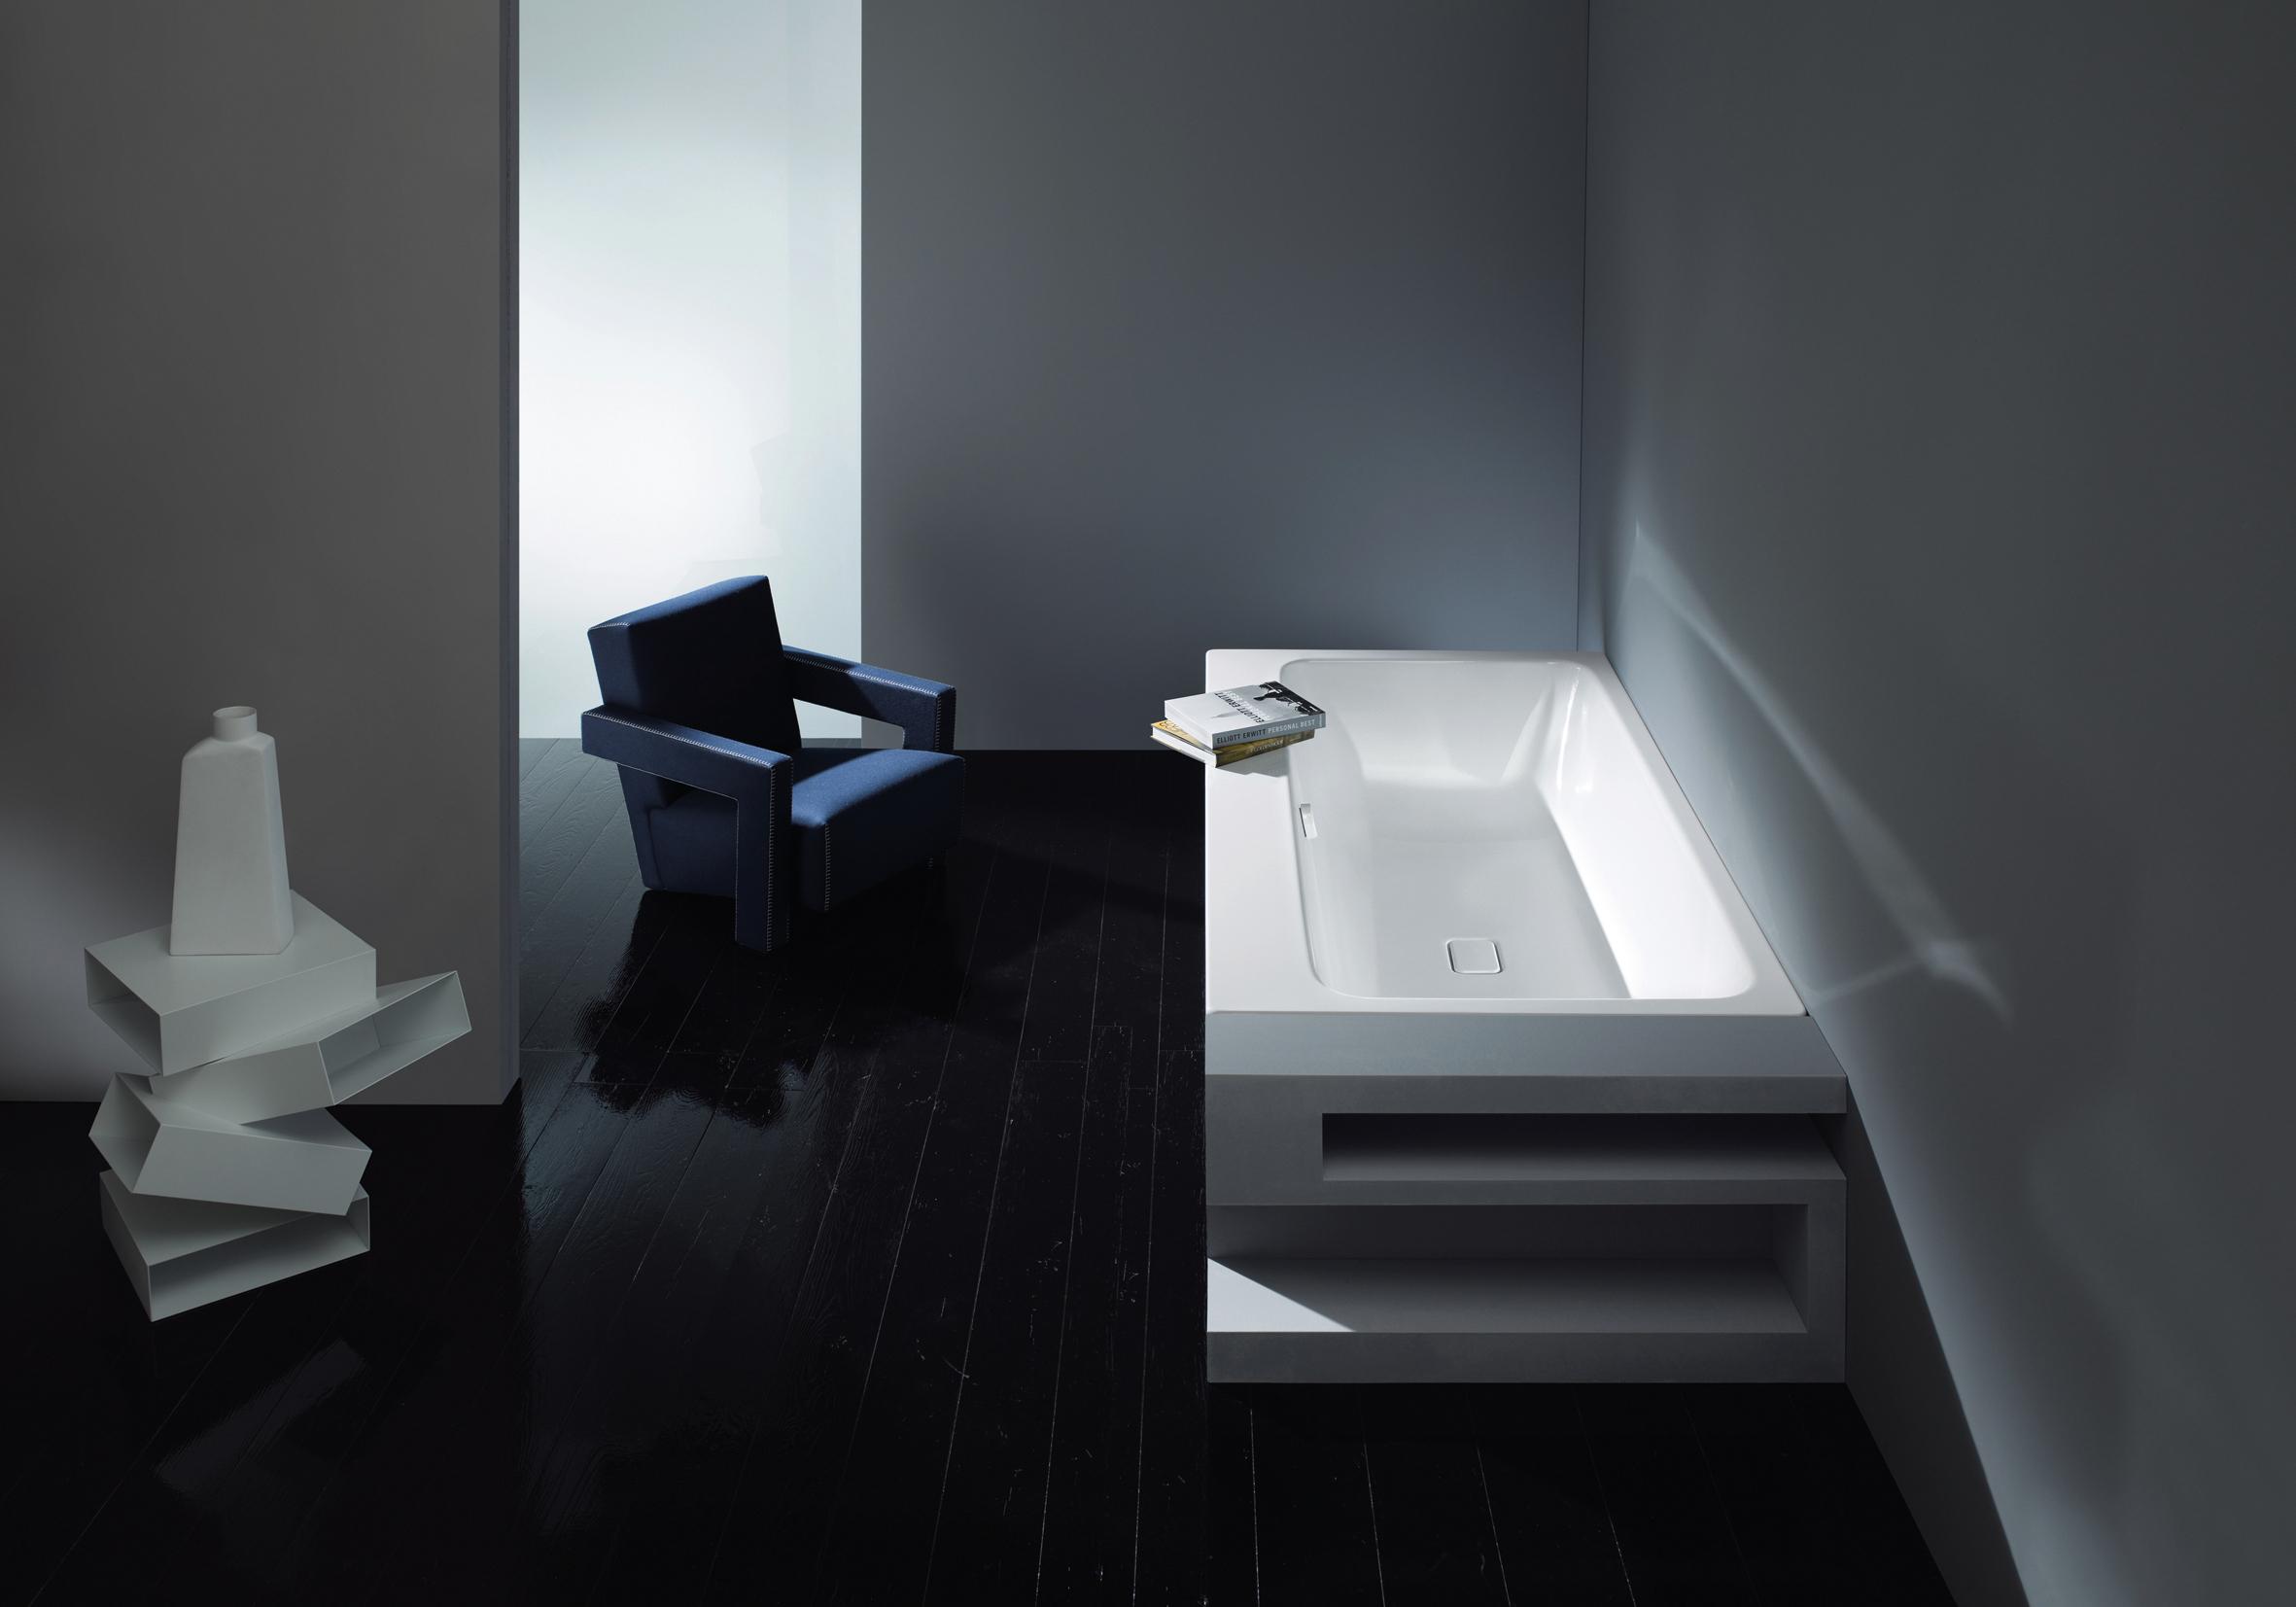 shk profi themen bad design wannen duschen kaldewei iconic awards 2013. Black Bedroom Furniture Sets. Home Design Ideas